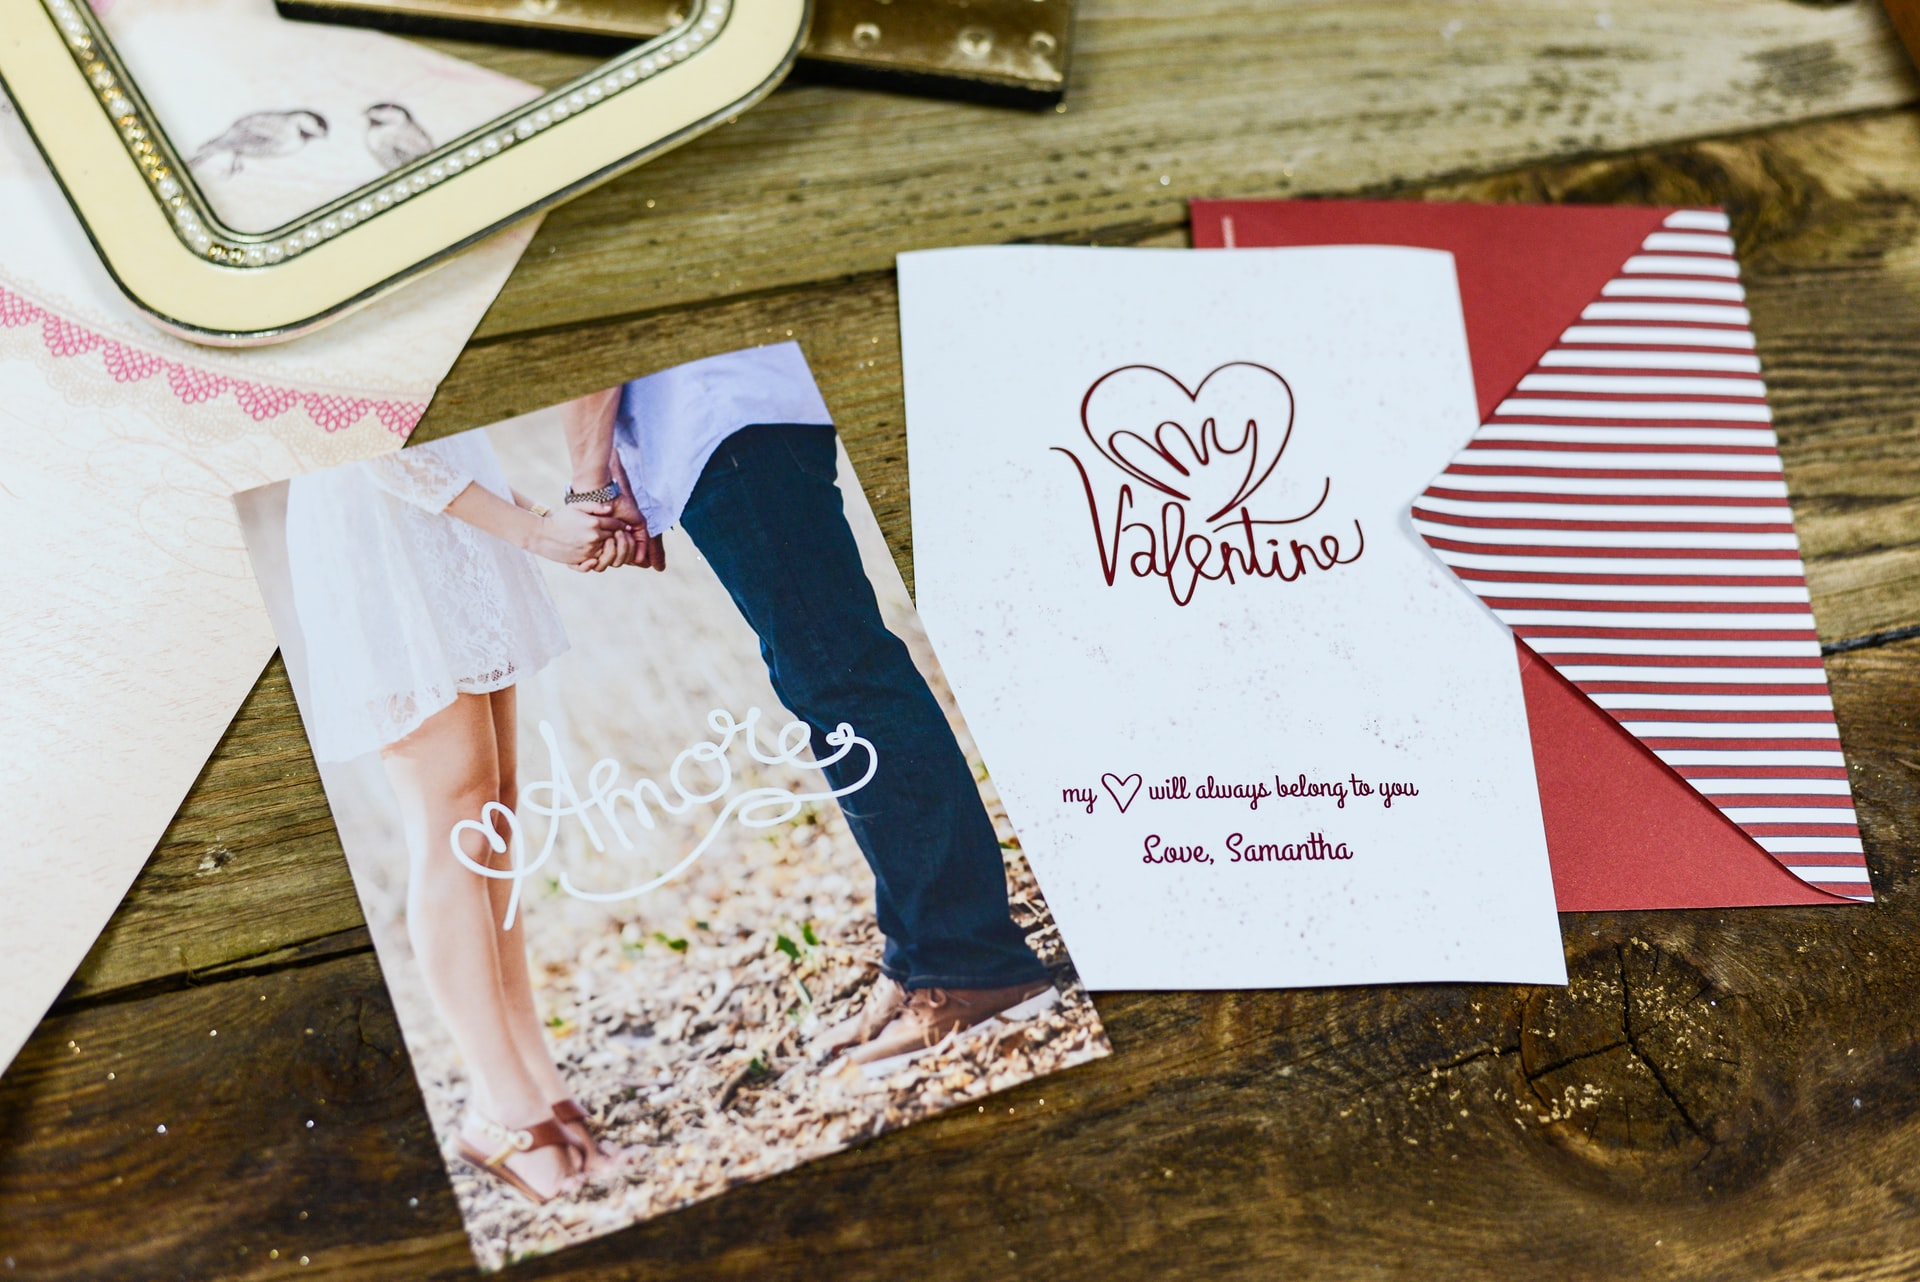 Need a V-Day Card Near 14W? Head to Copenhaver!